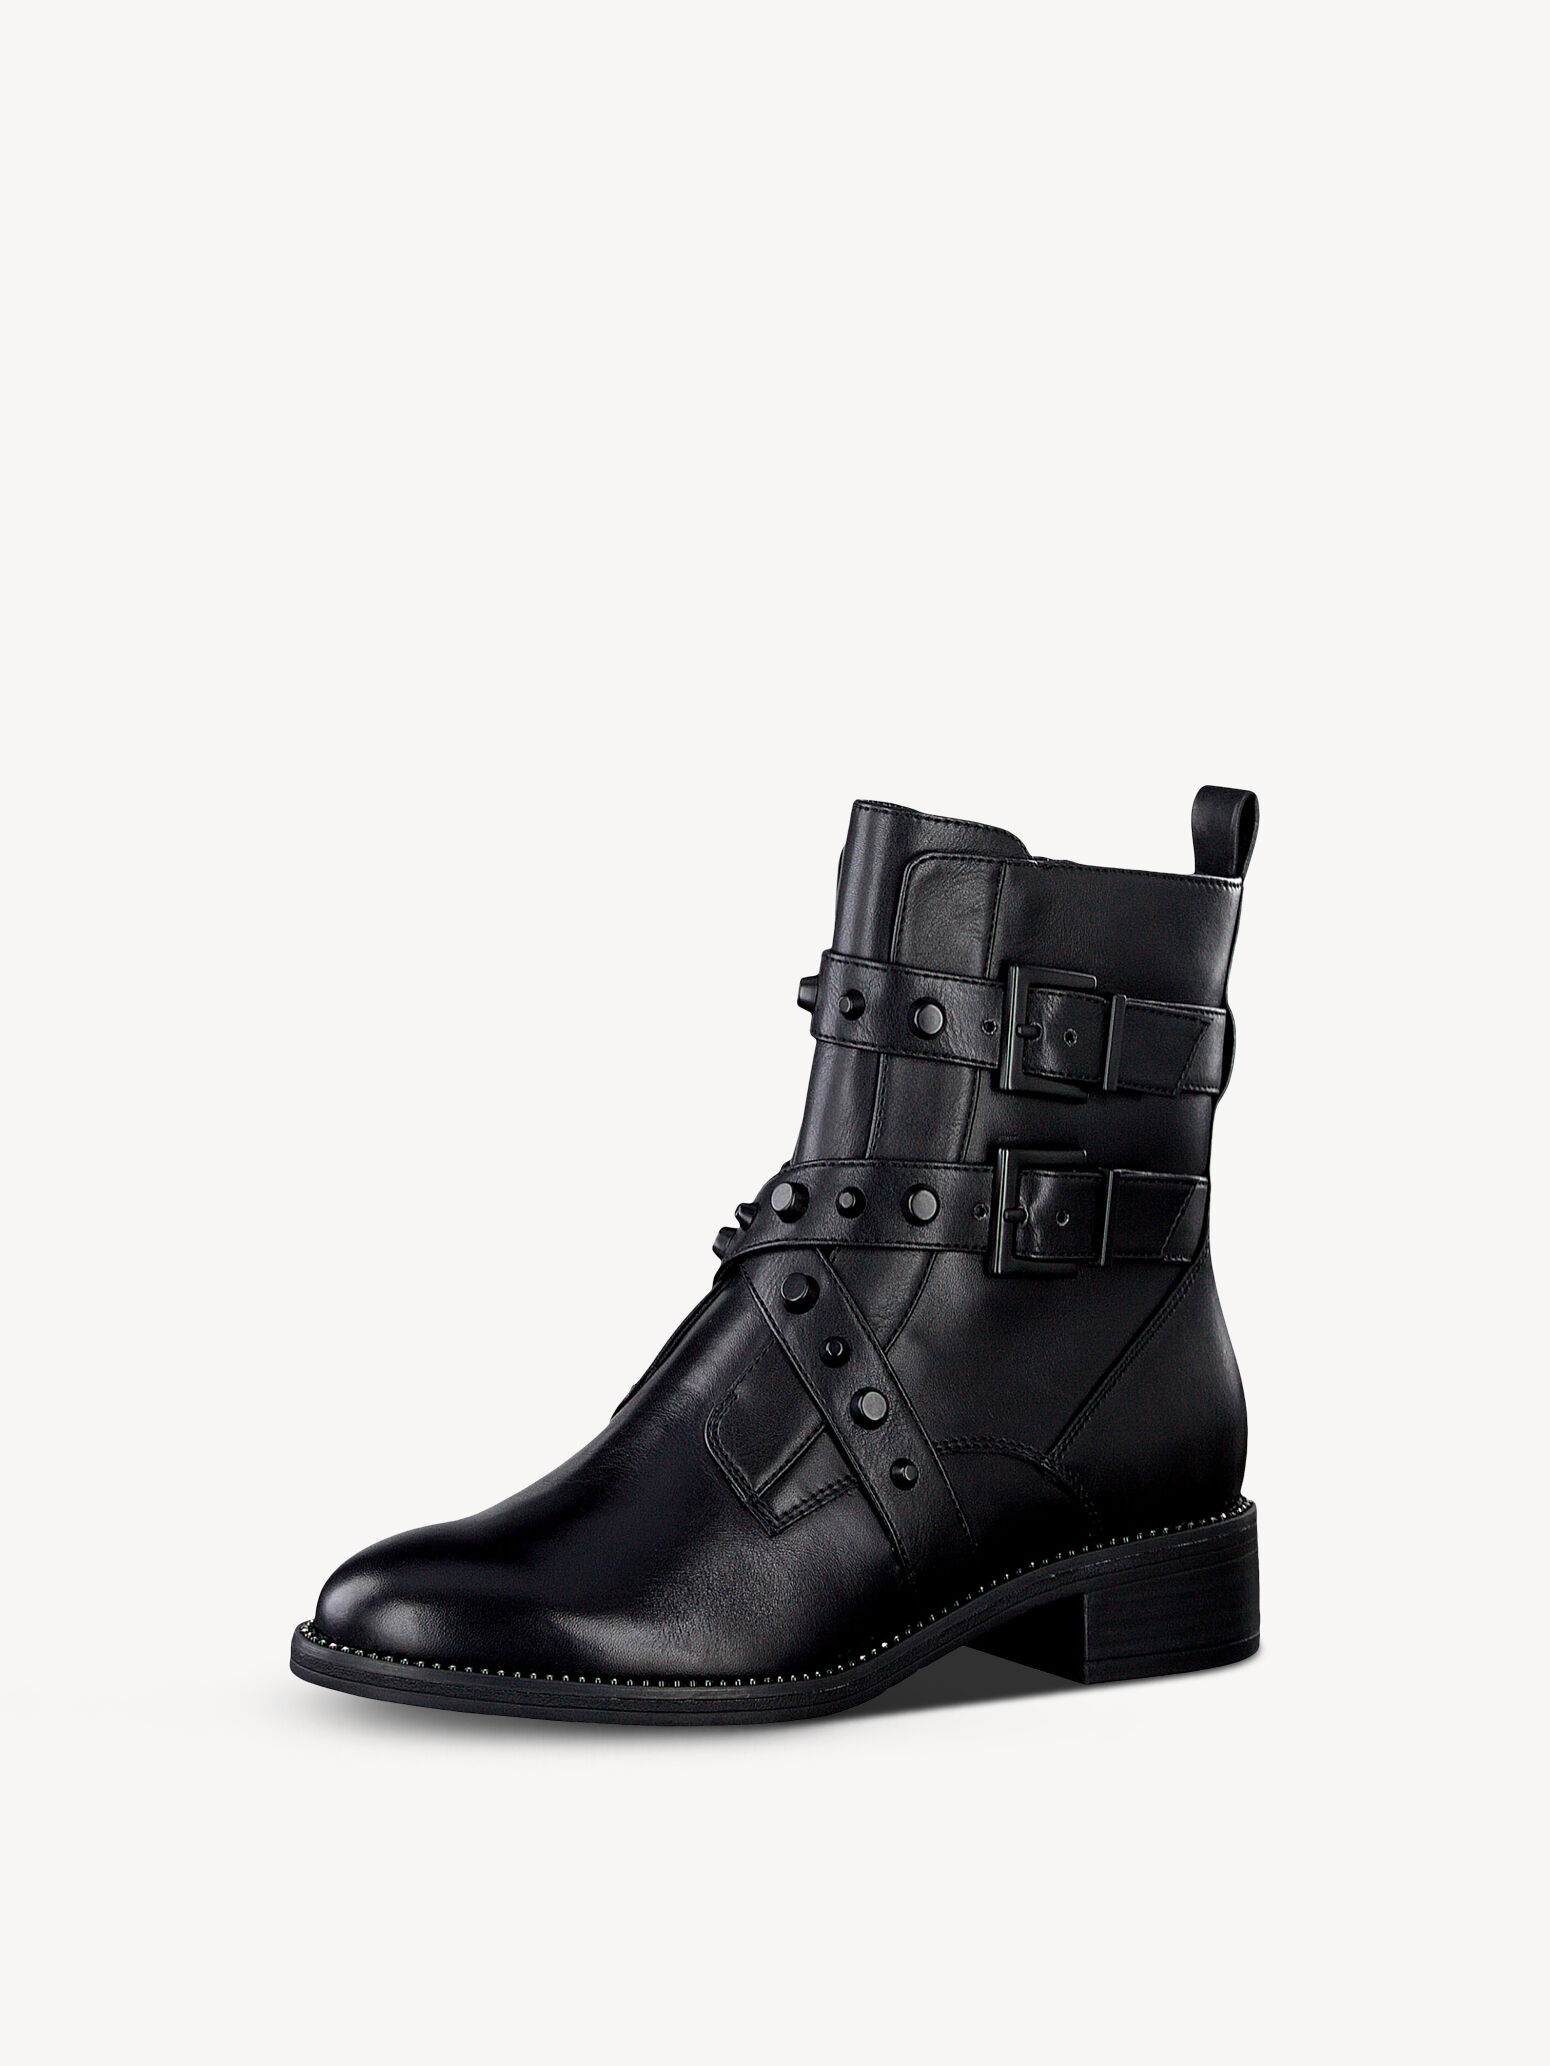 Tamaris Leather Boots (1 1 25048 23) black ab 69,95